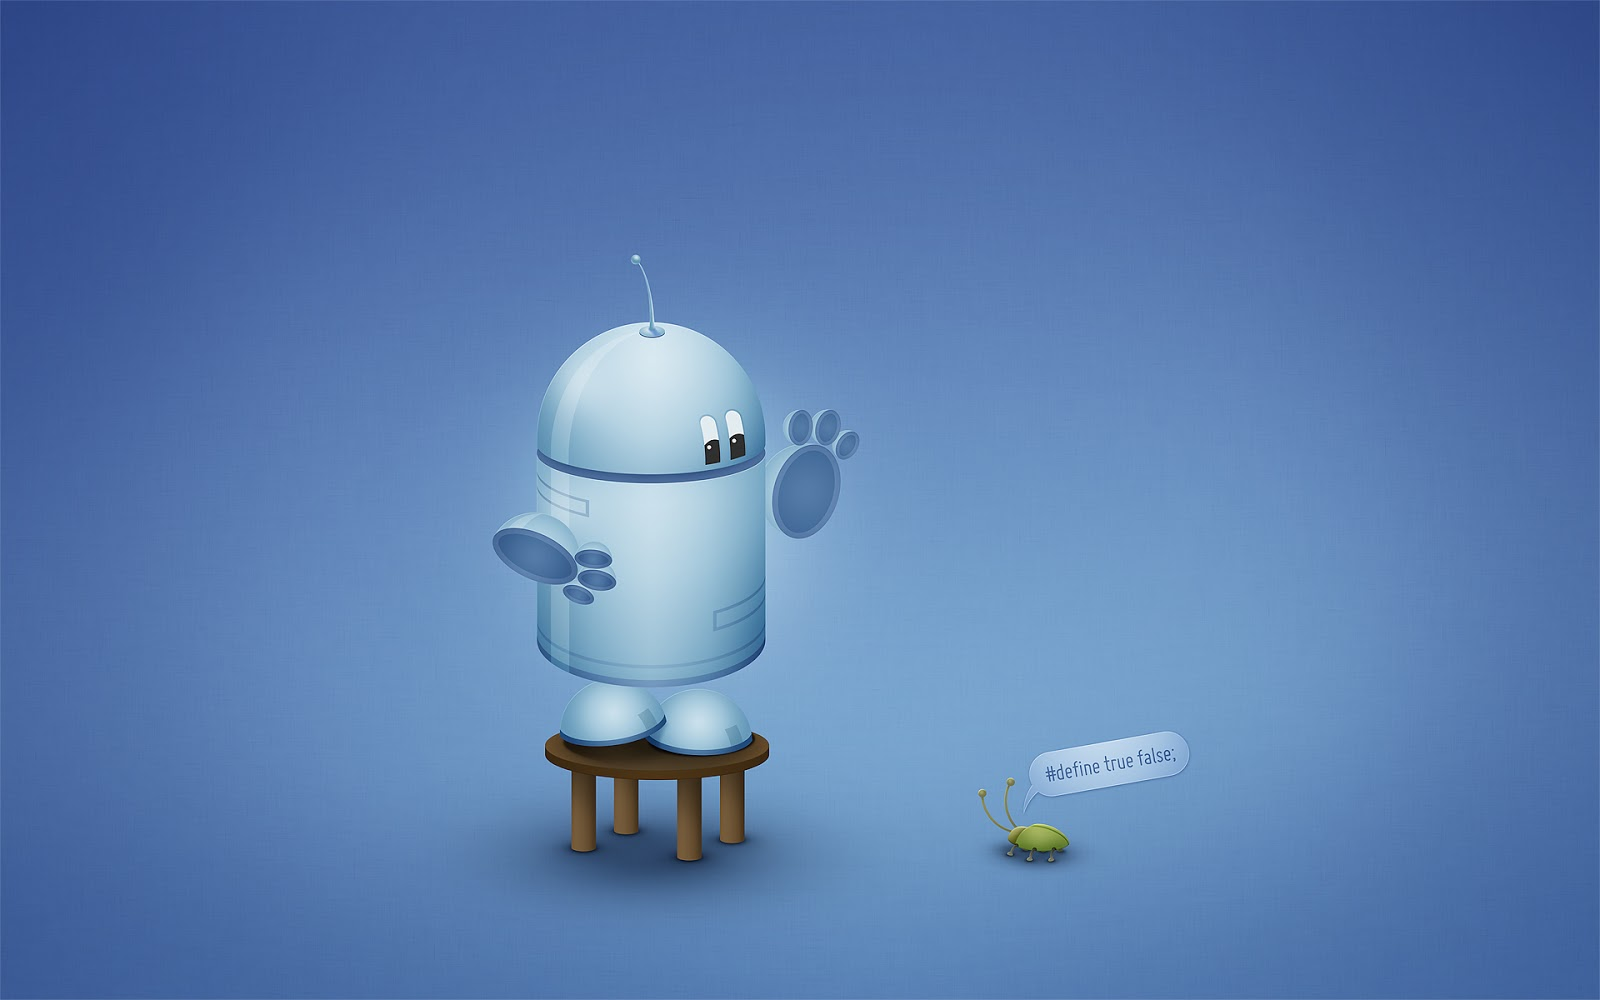 Imagenes hilandy fondo de pantalla robot android for Wallpapers 3d con movimiento para android